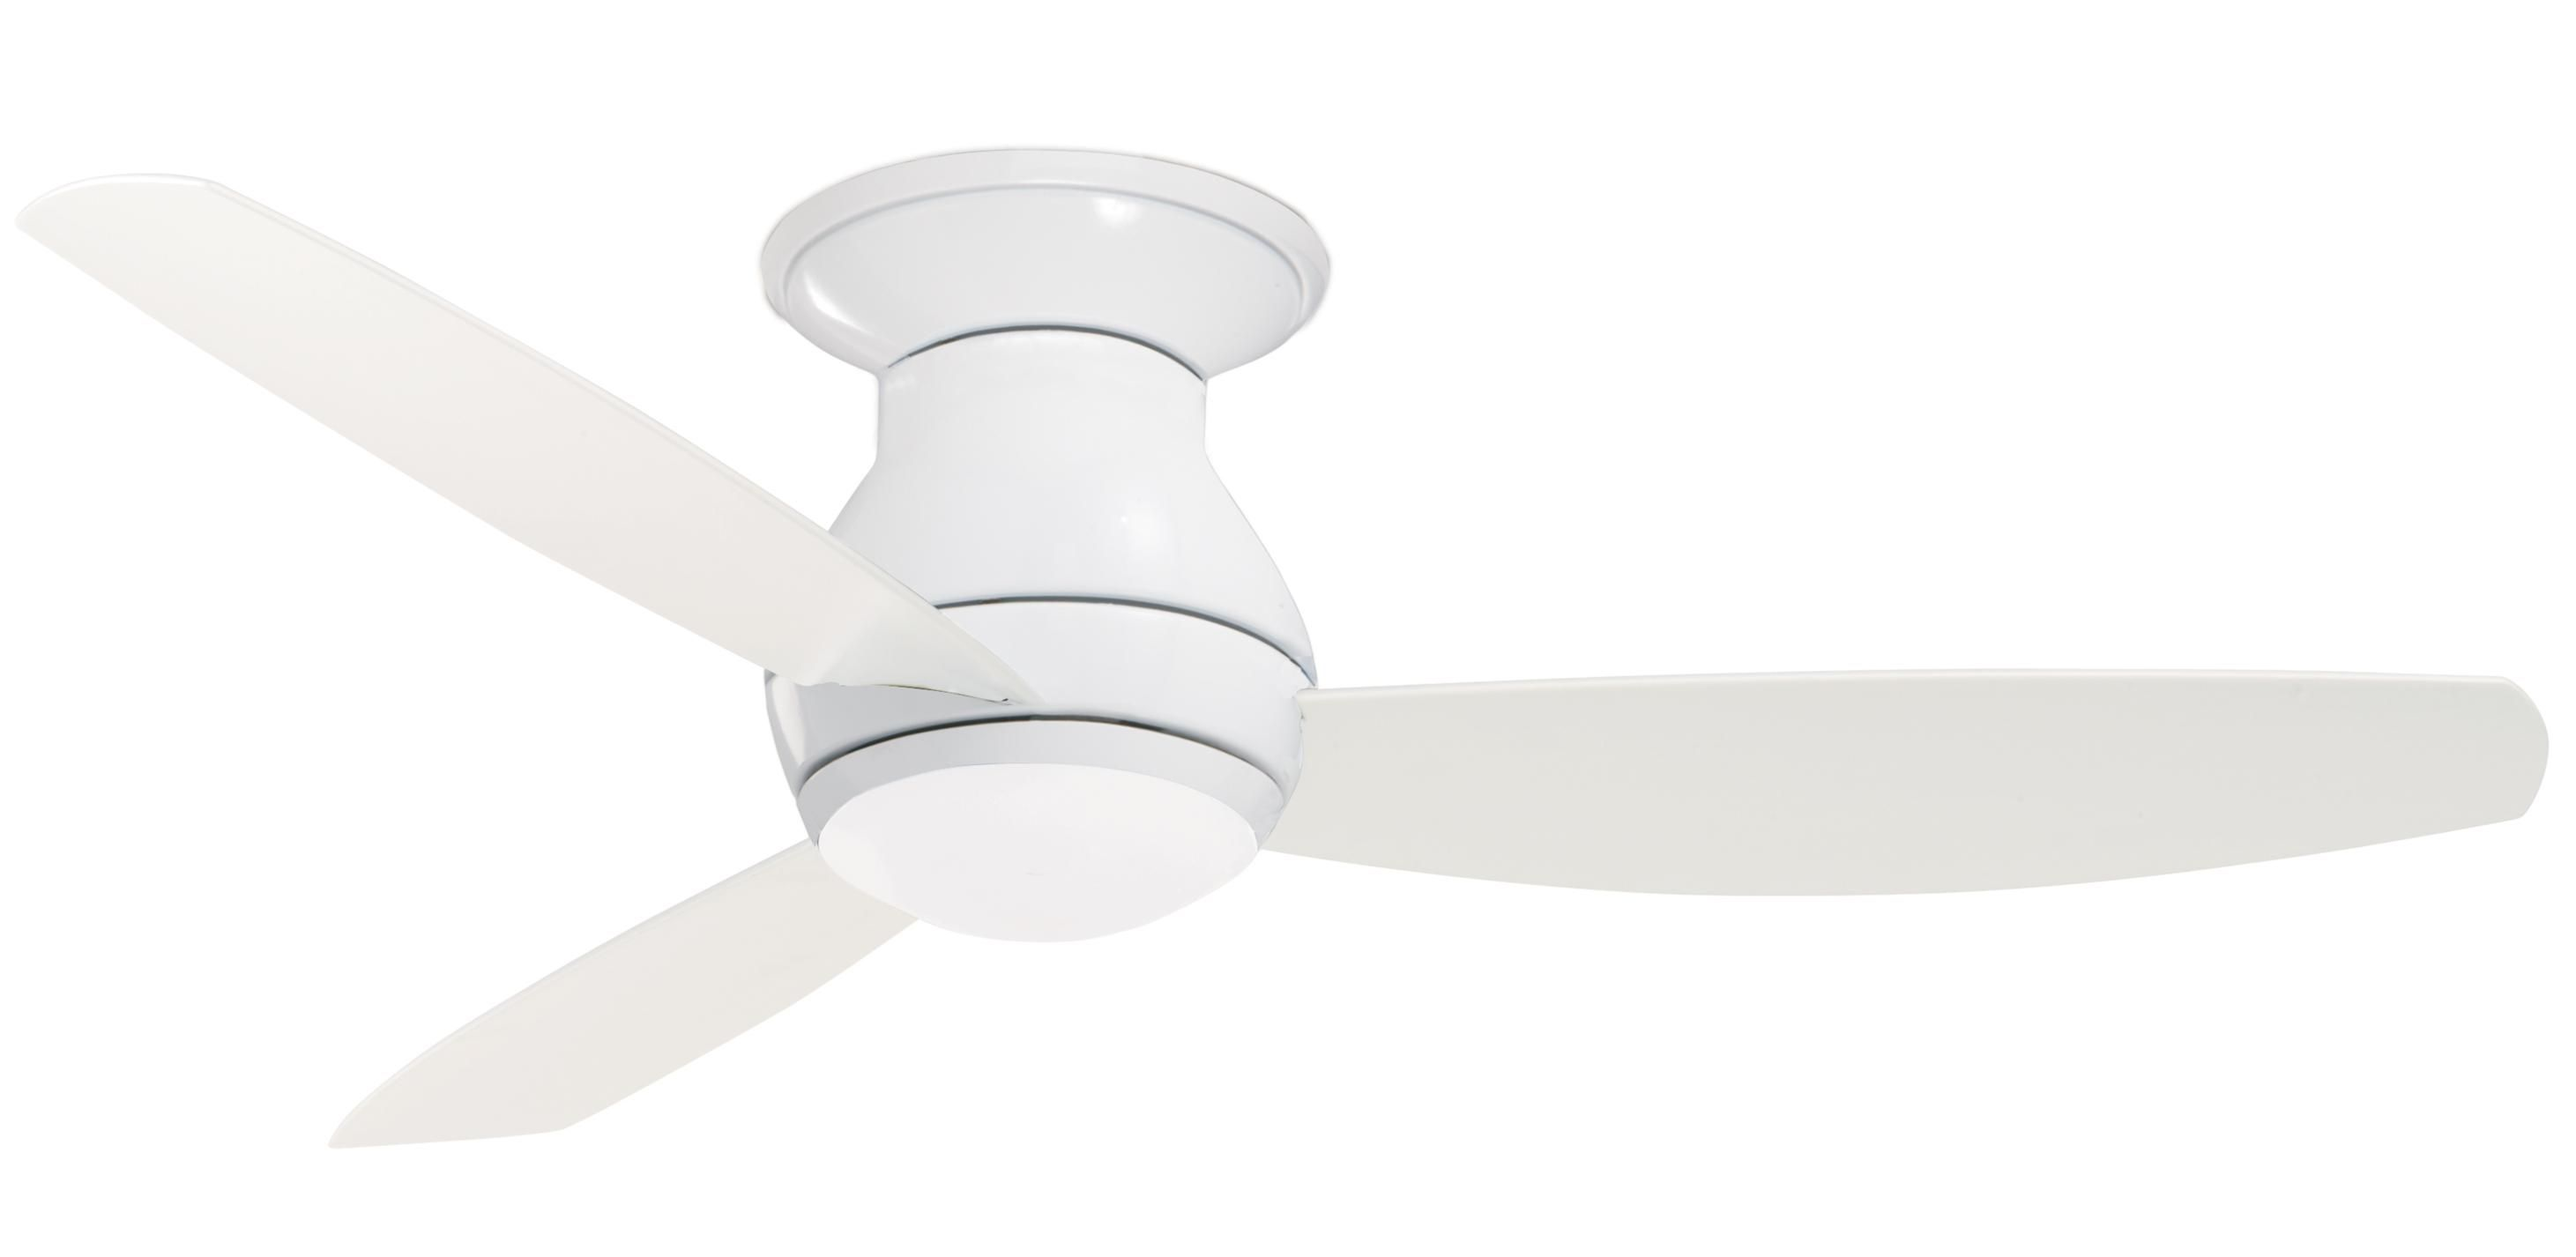 Emerson Curva Sky 52 Cf152ww Airflow Rating 5393 Cfm Cubic Feet Per Minute This Fan Has 6 Speeds Hugger Ceiling Fan Ceiling Fan Flush Mount Ceiling Fan